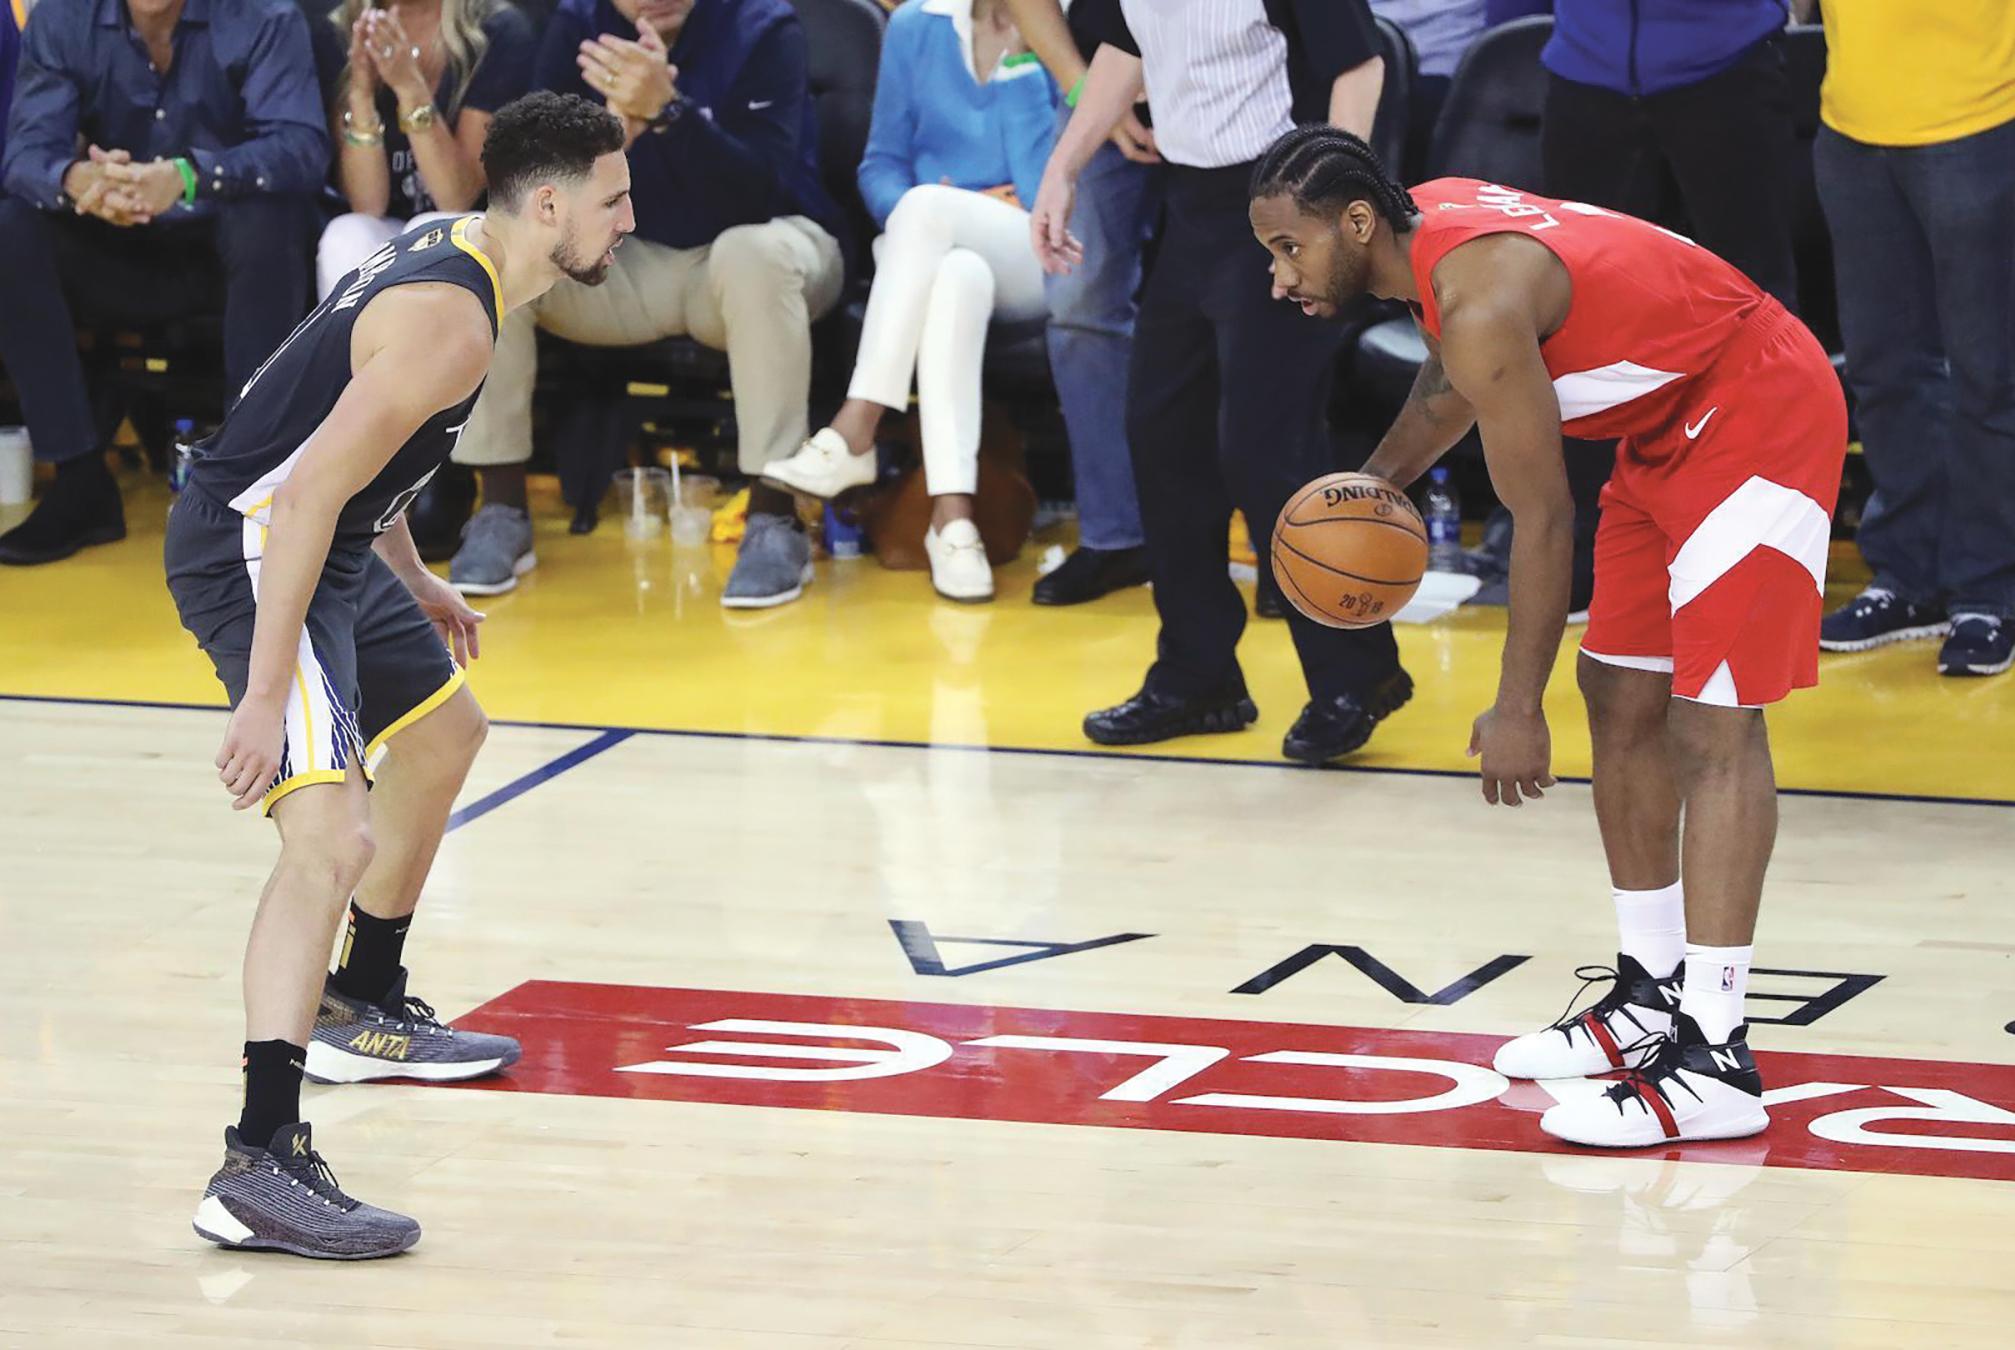 Kawhi Leonard's hot hand is sending the Raptors home to Toronto on the cusp of their first NBA championship. (NBA.com photo)